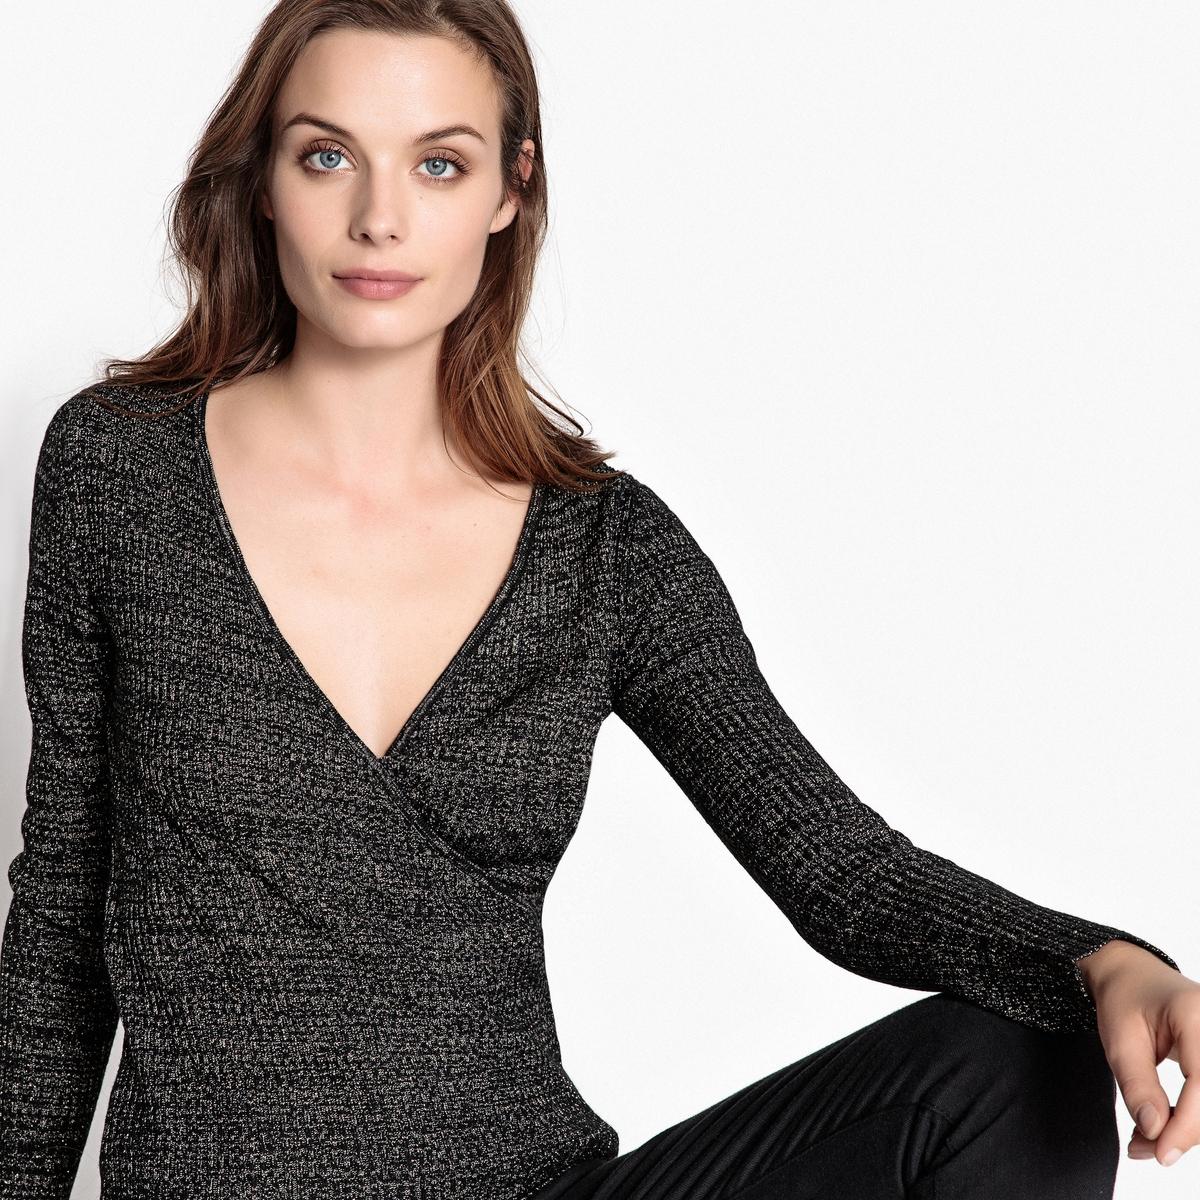 Пуловер в стиле каш-кёр из блестящего трикотажа